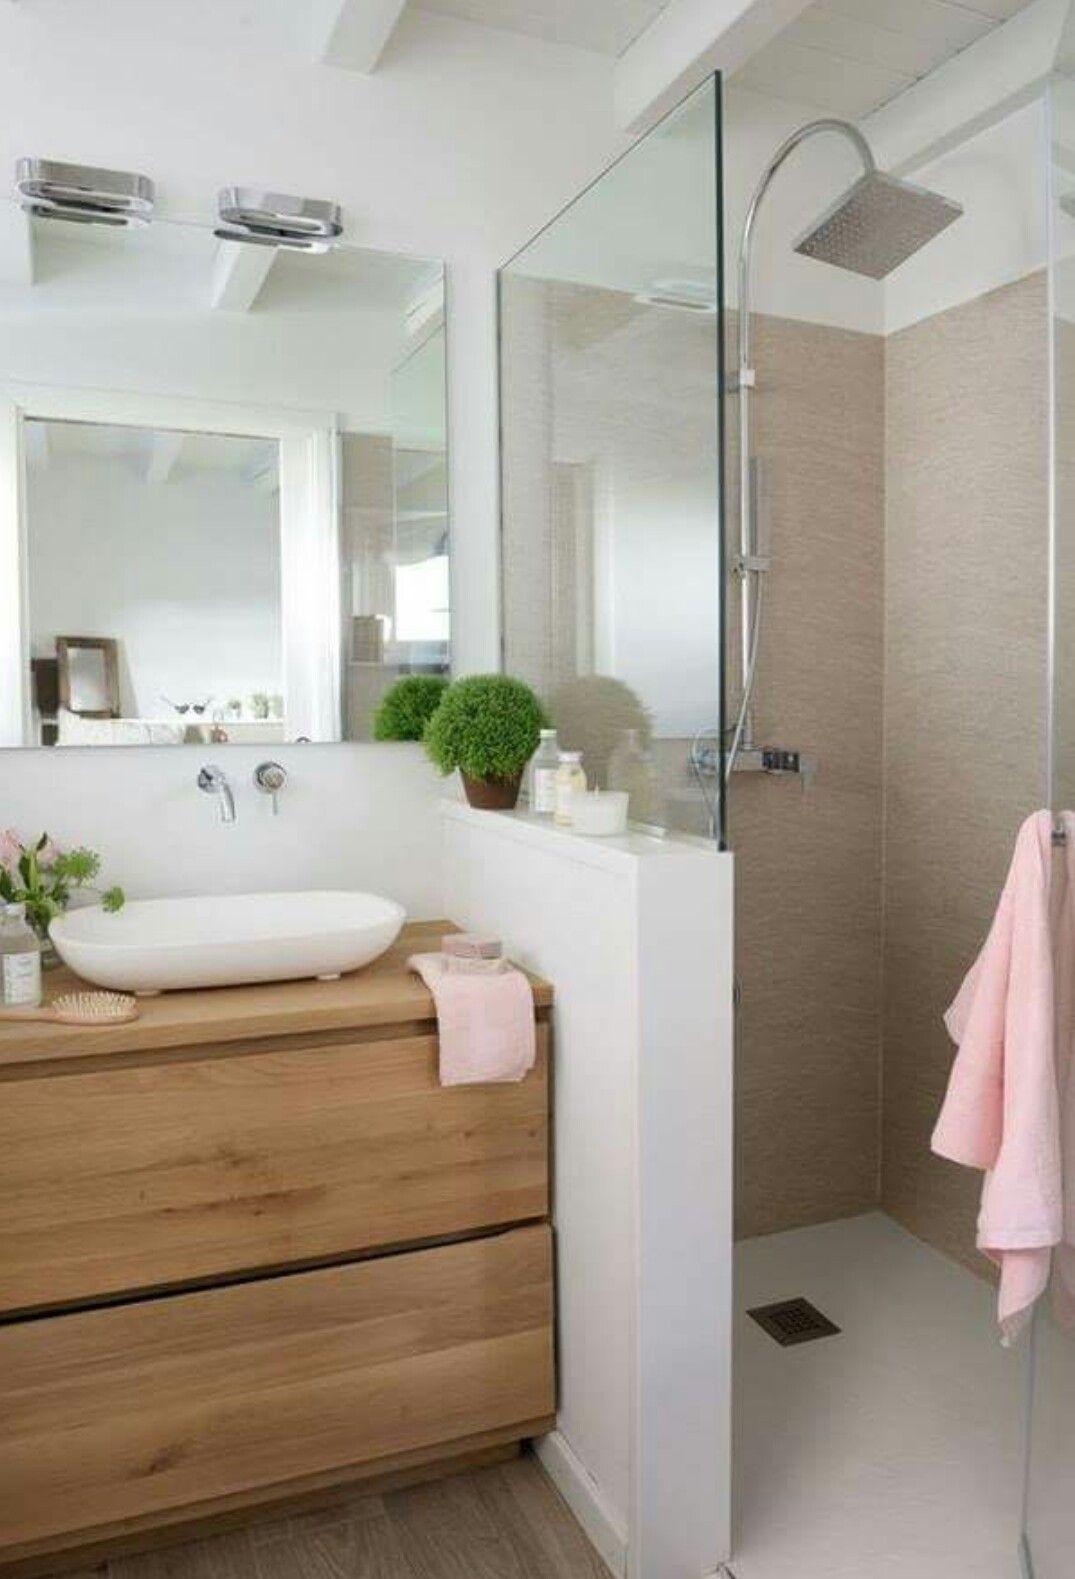 en suite idea for loft room azienka pinterest badezimmer bad und baden. Black Bedroom Furniture Sets. Home Design Ideas